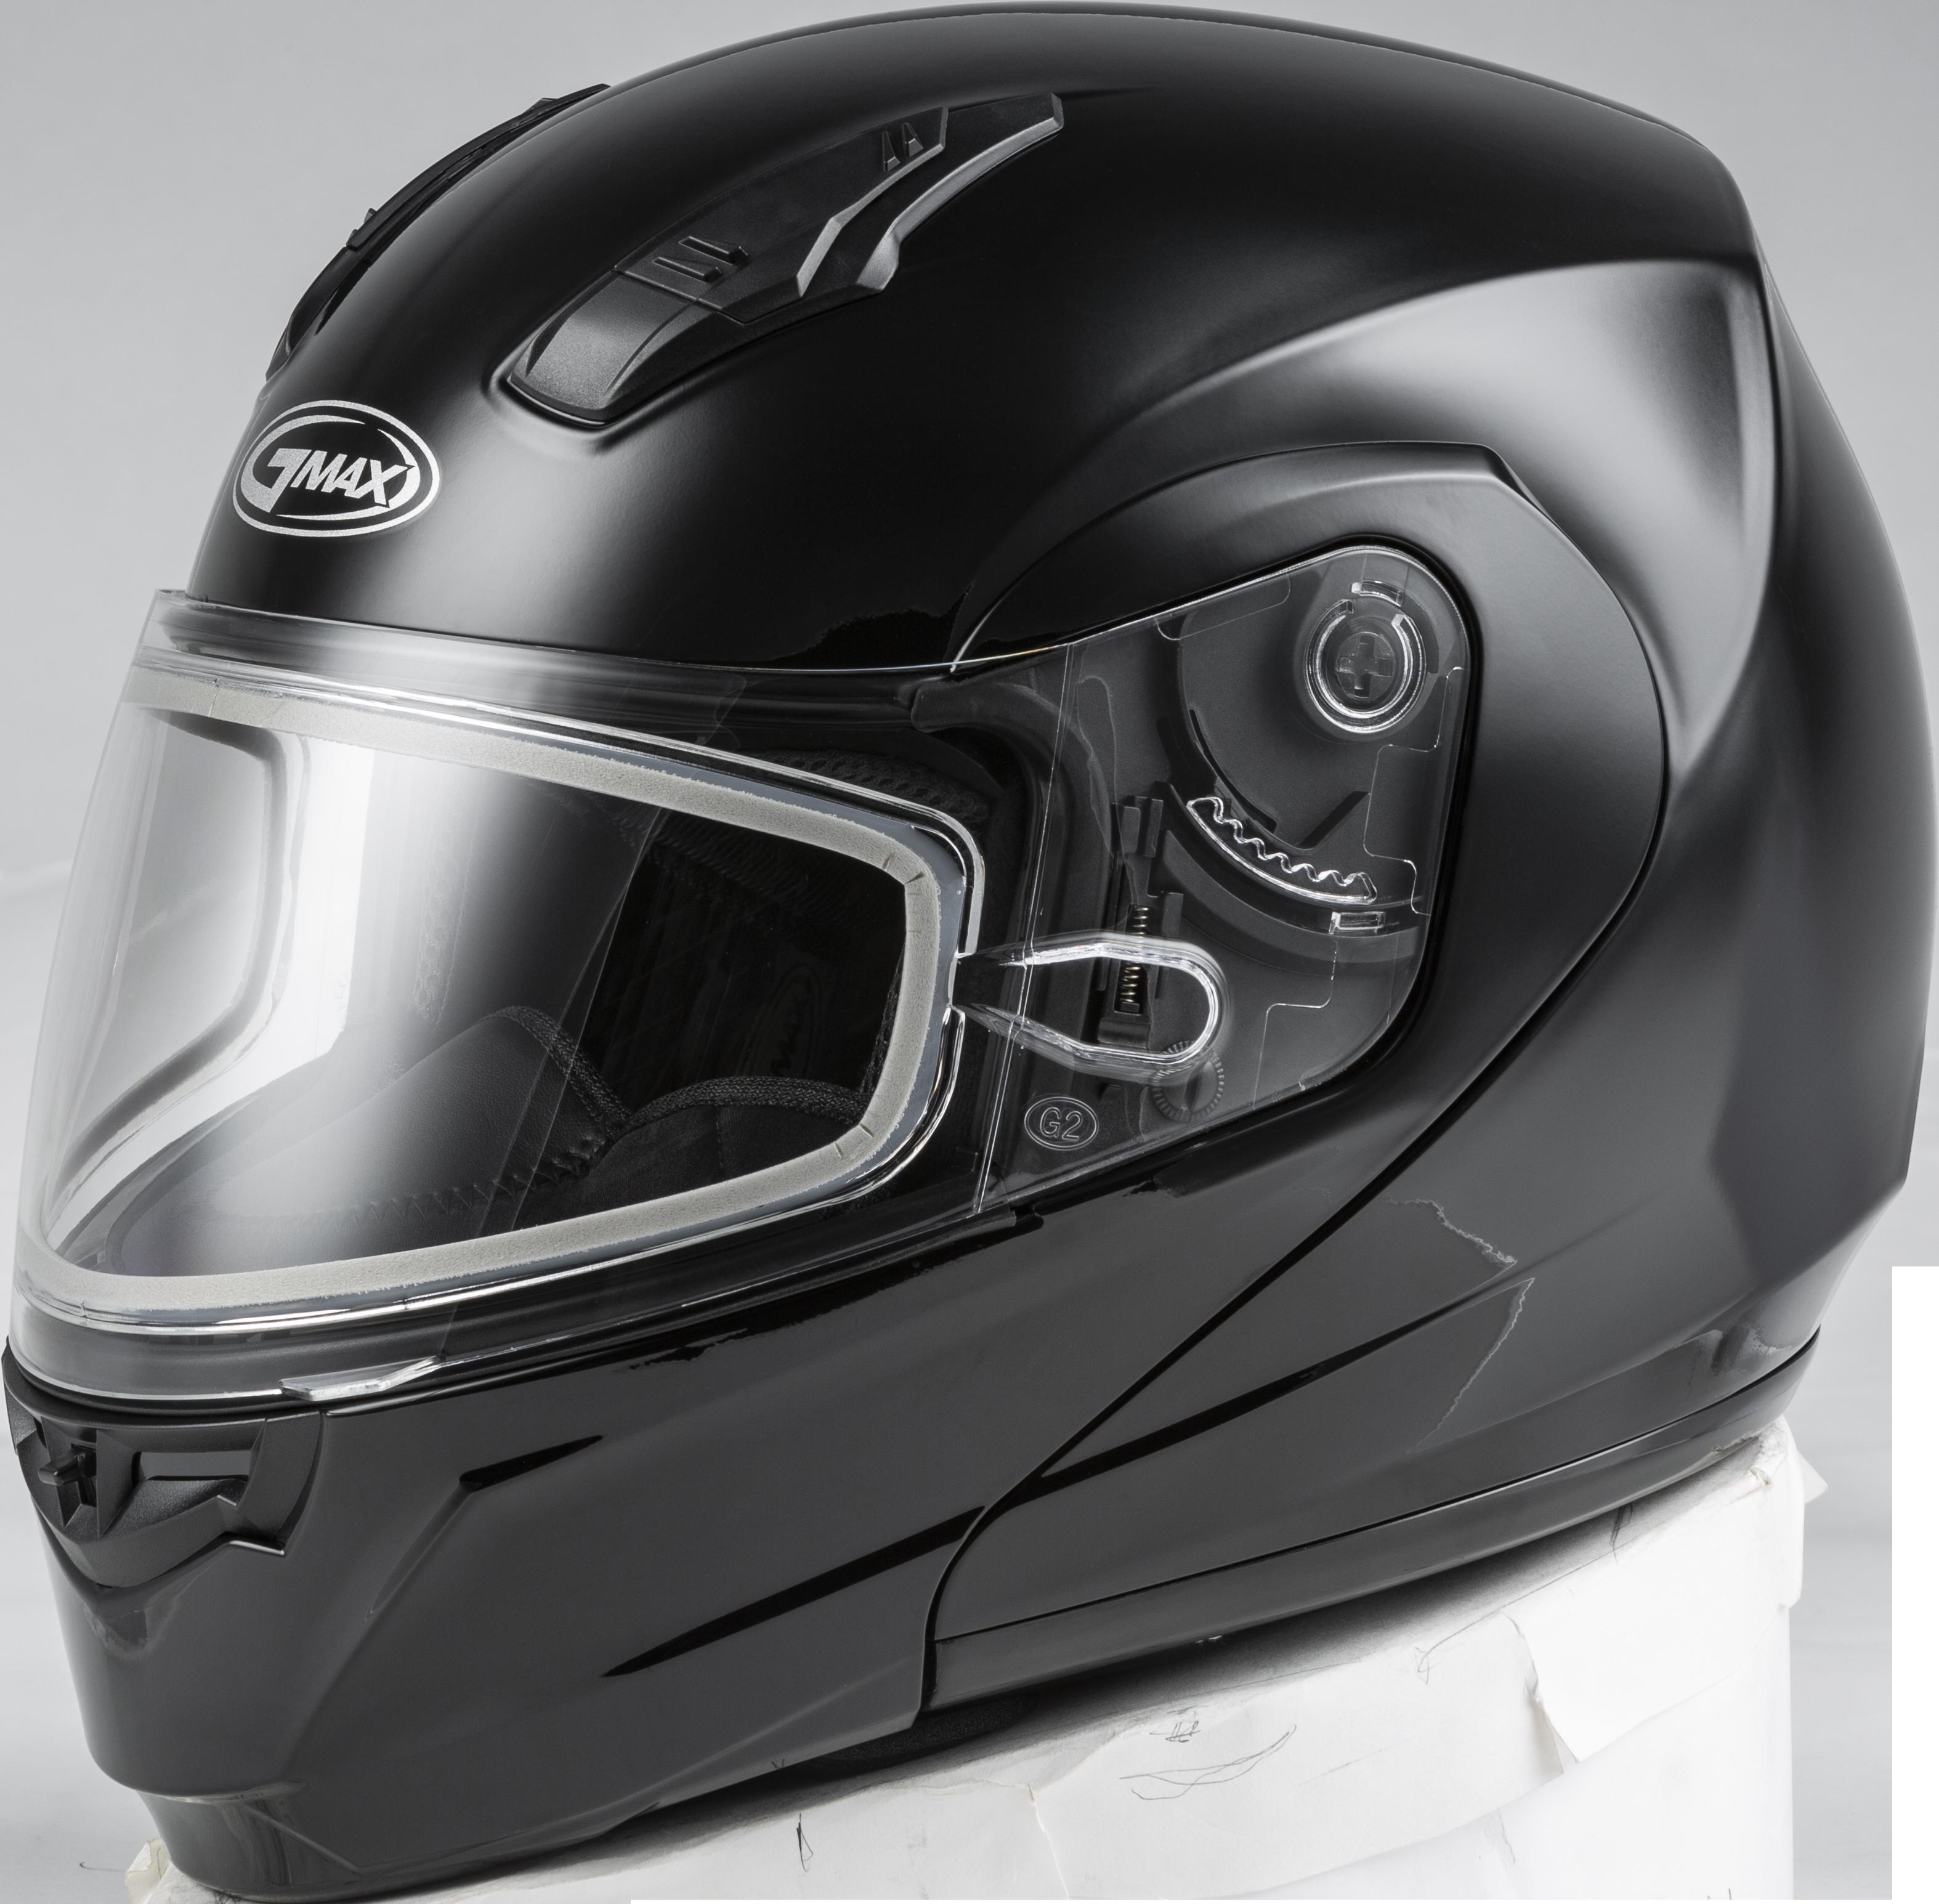 MD-04S Snow Helmet Solid w/Quick Release Buckle